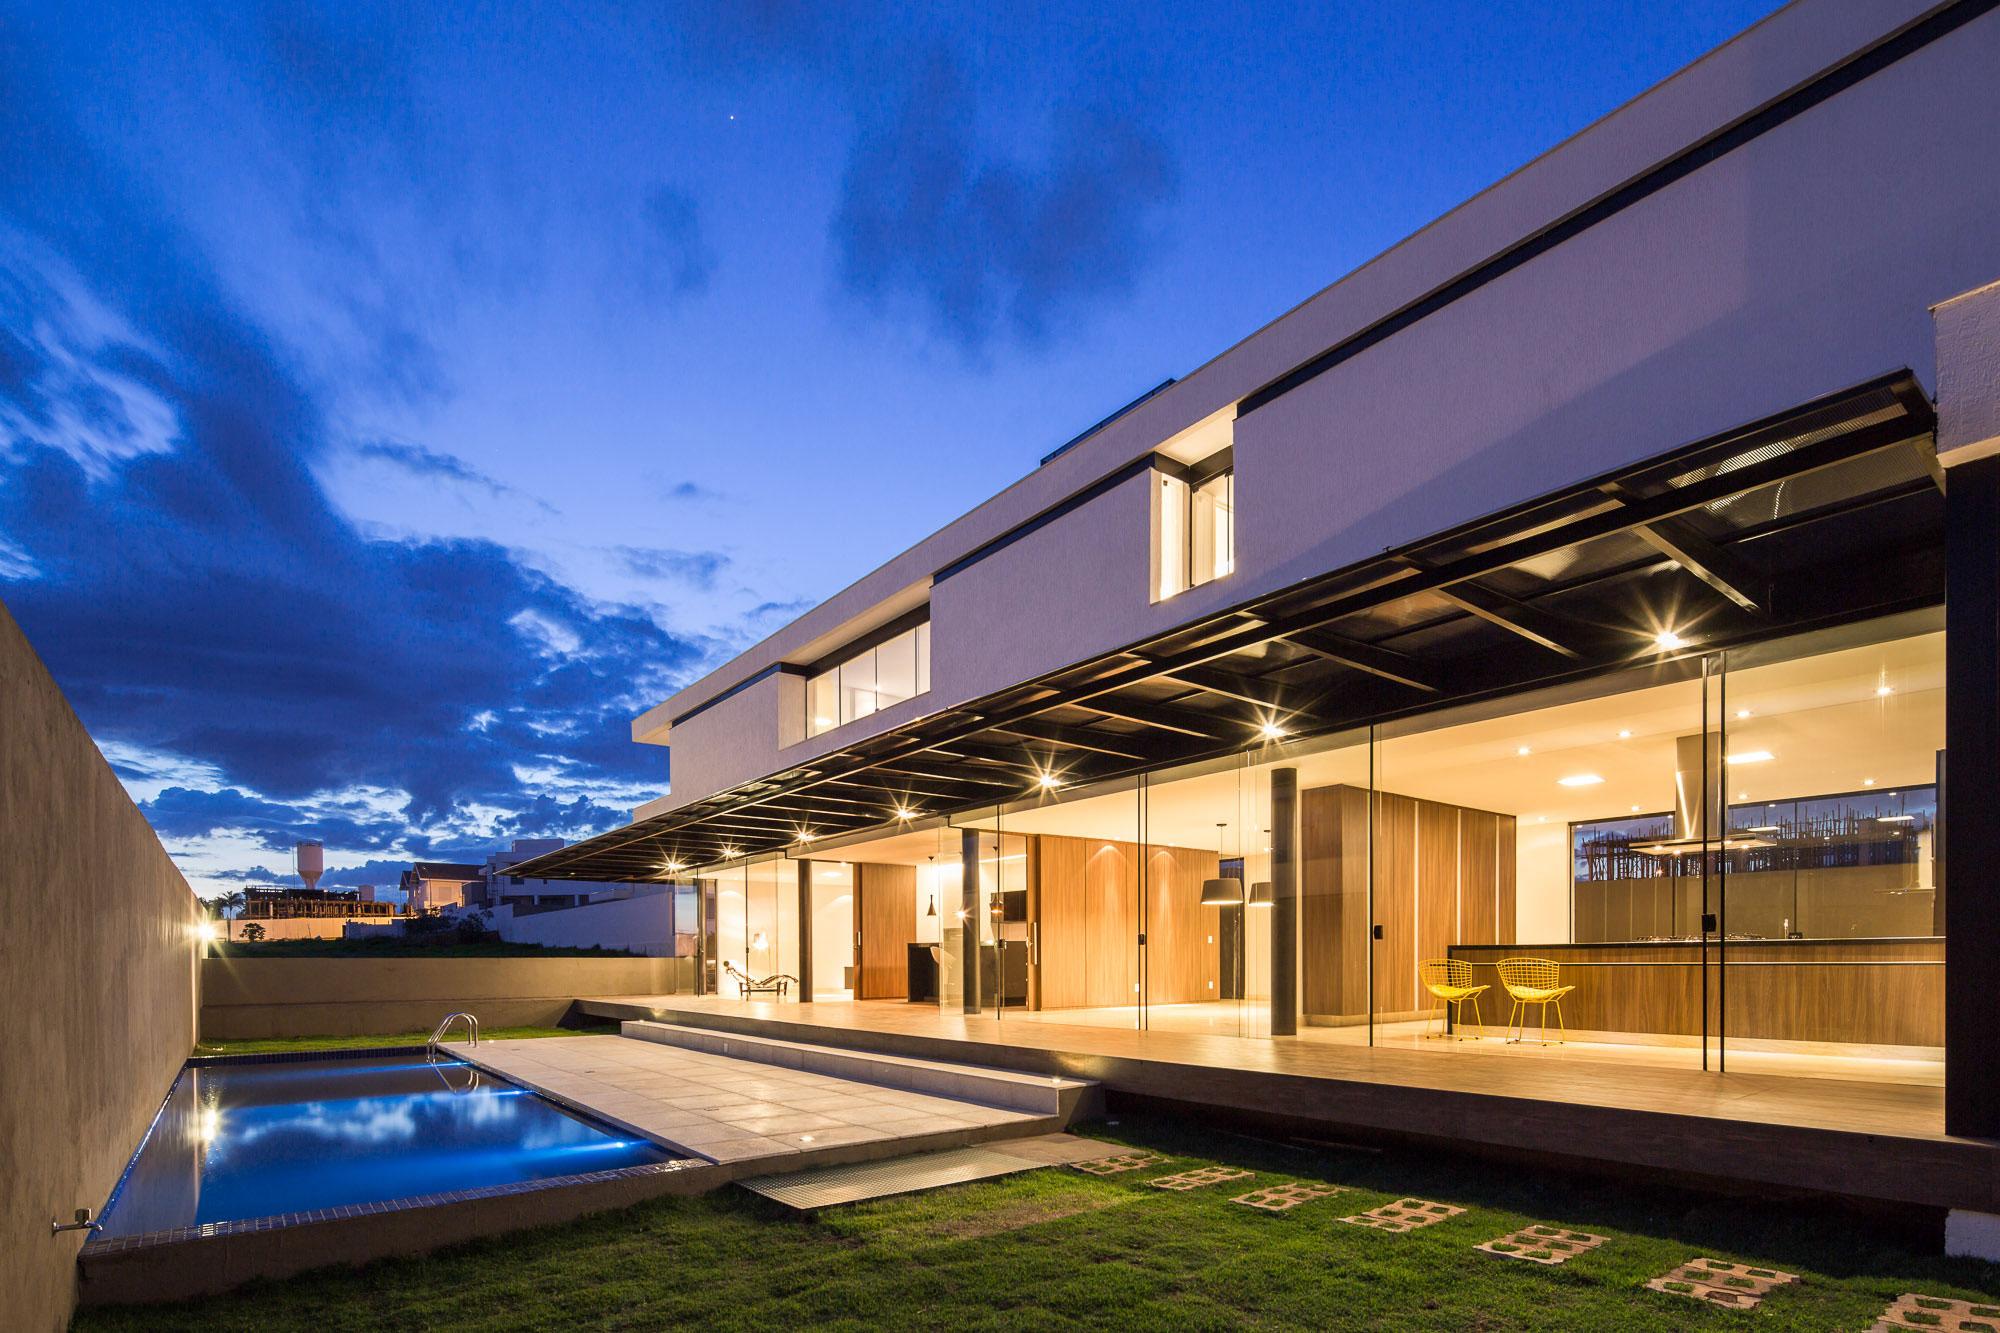 Casa MCO by Esquadra|Yi-11